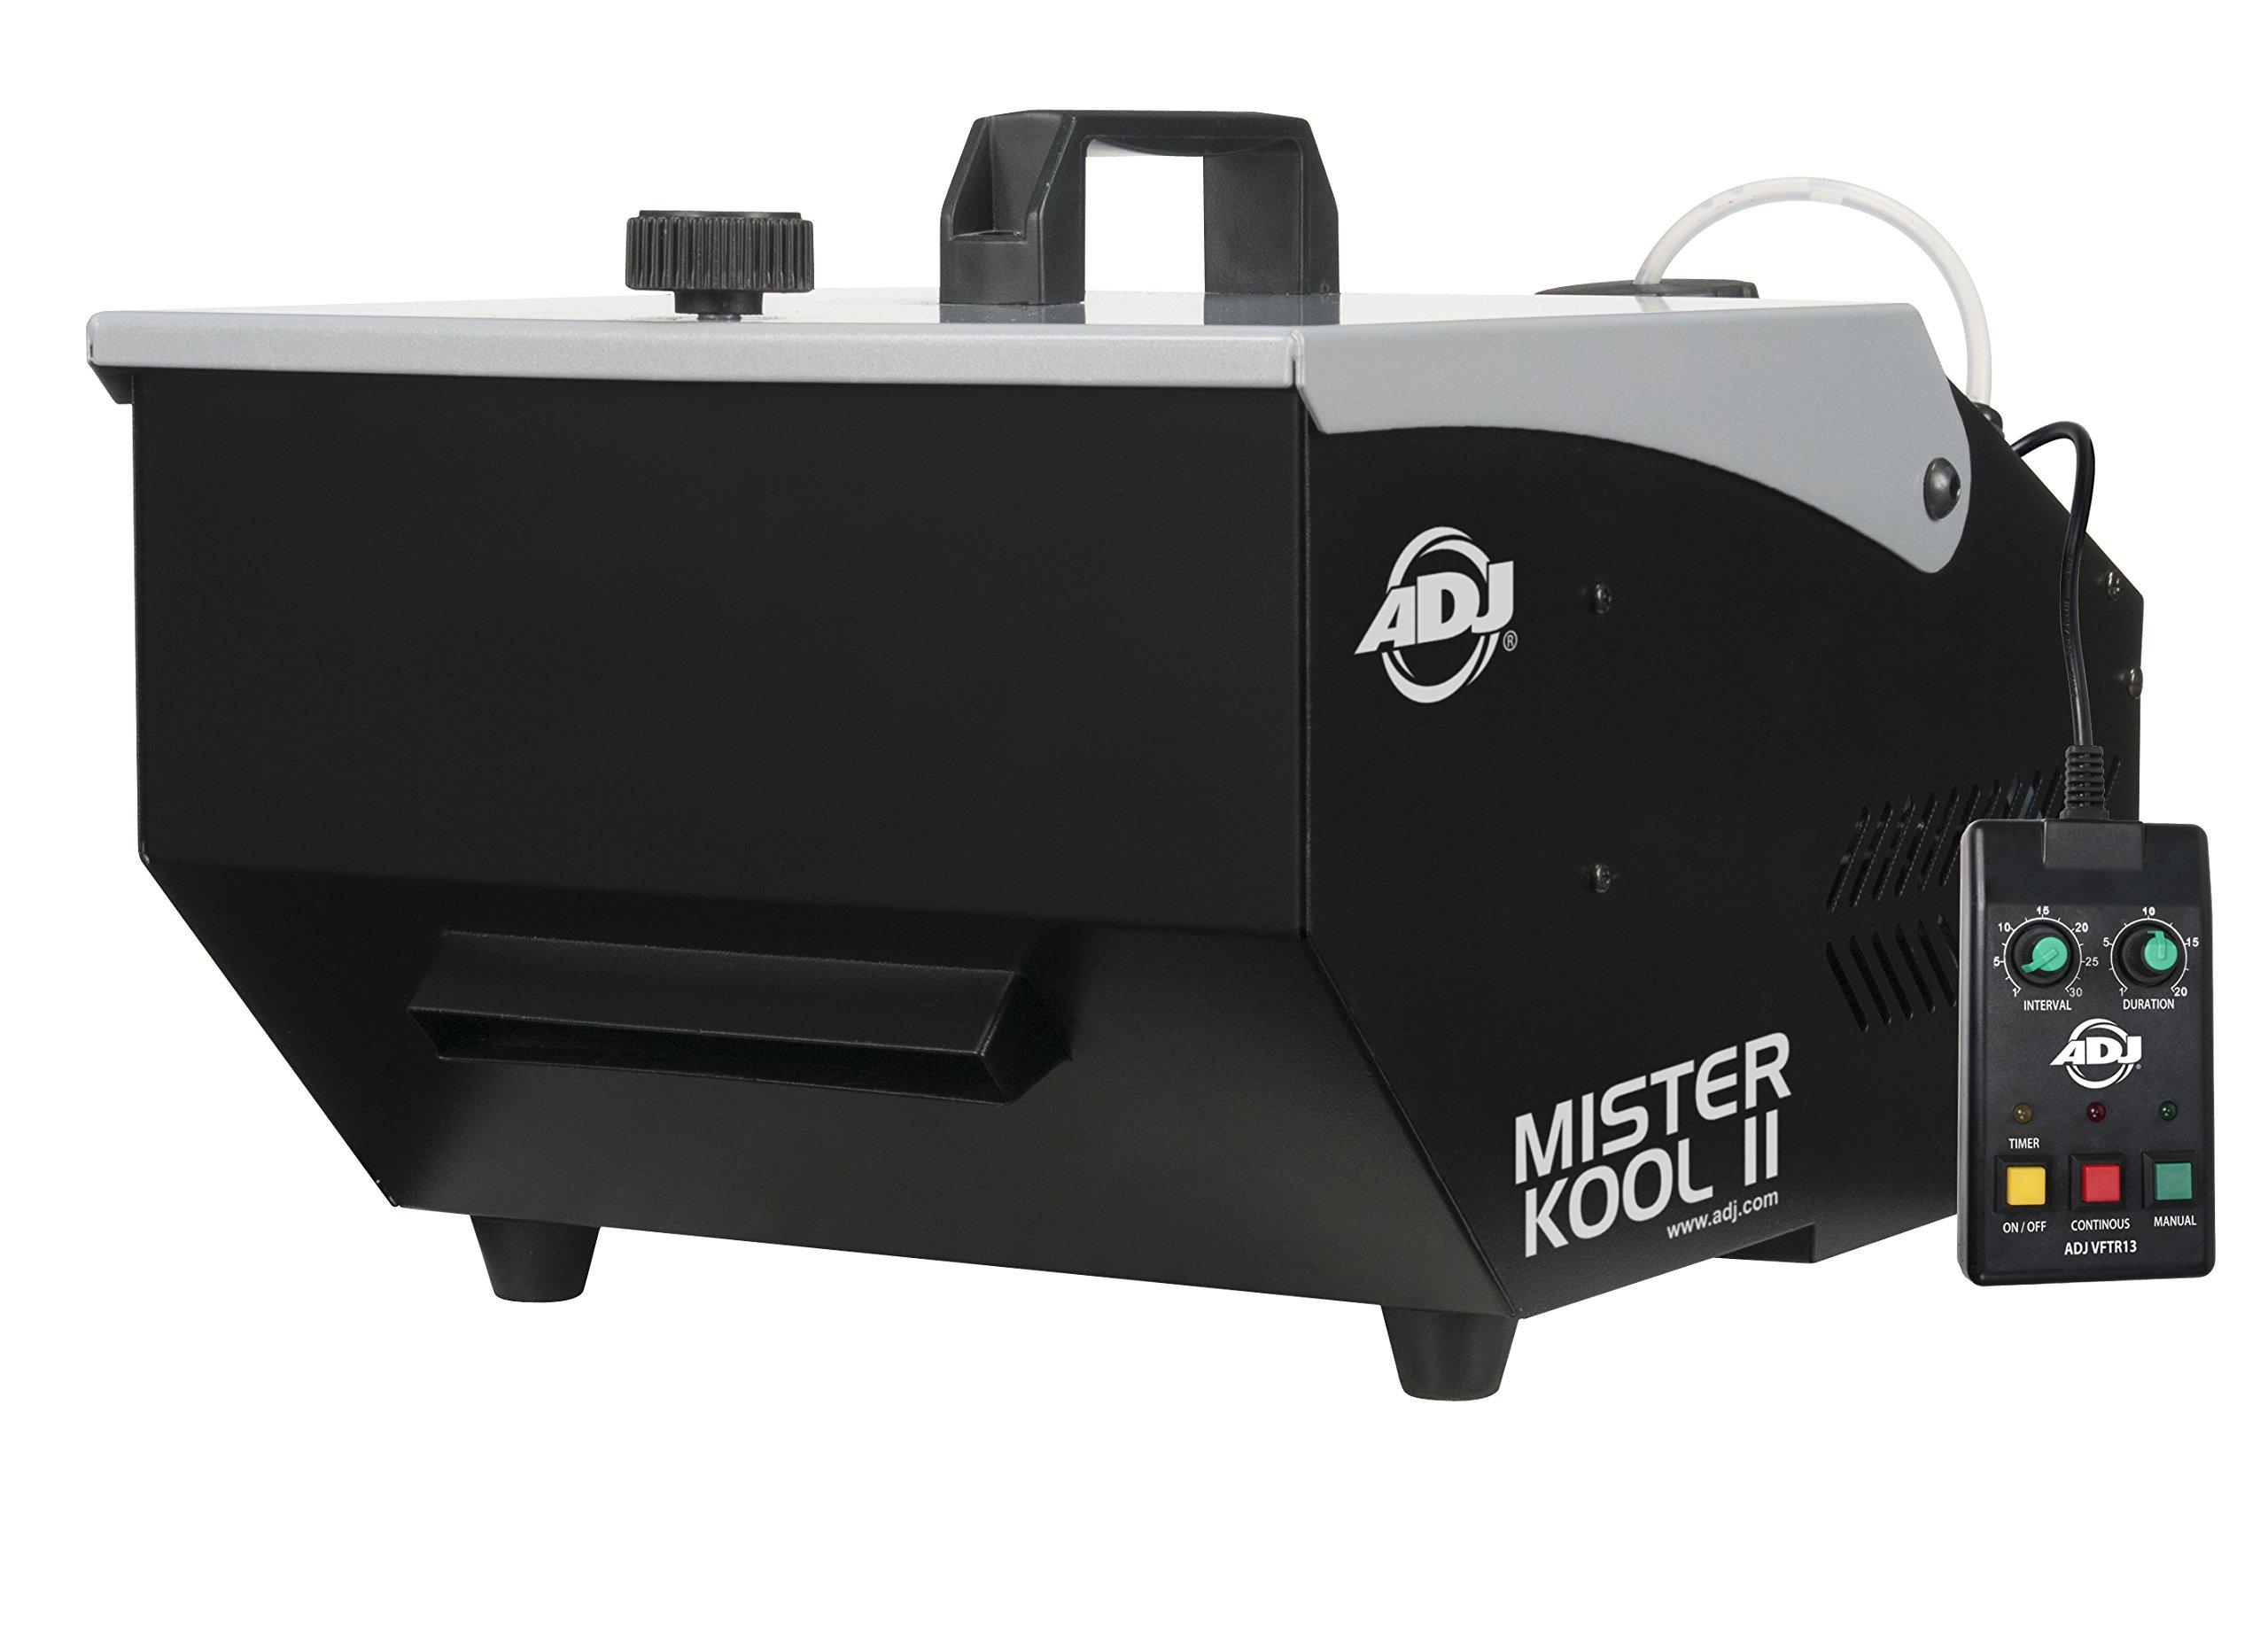 ADJ Mister Kool II Grave Yard Low Lying Water Based Fog Machine by ADJ Products